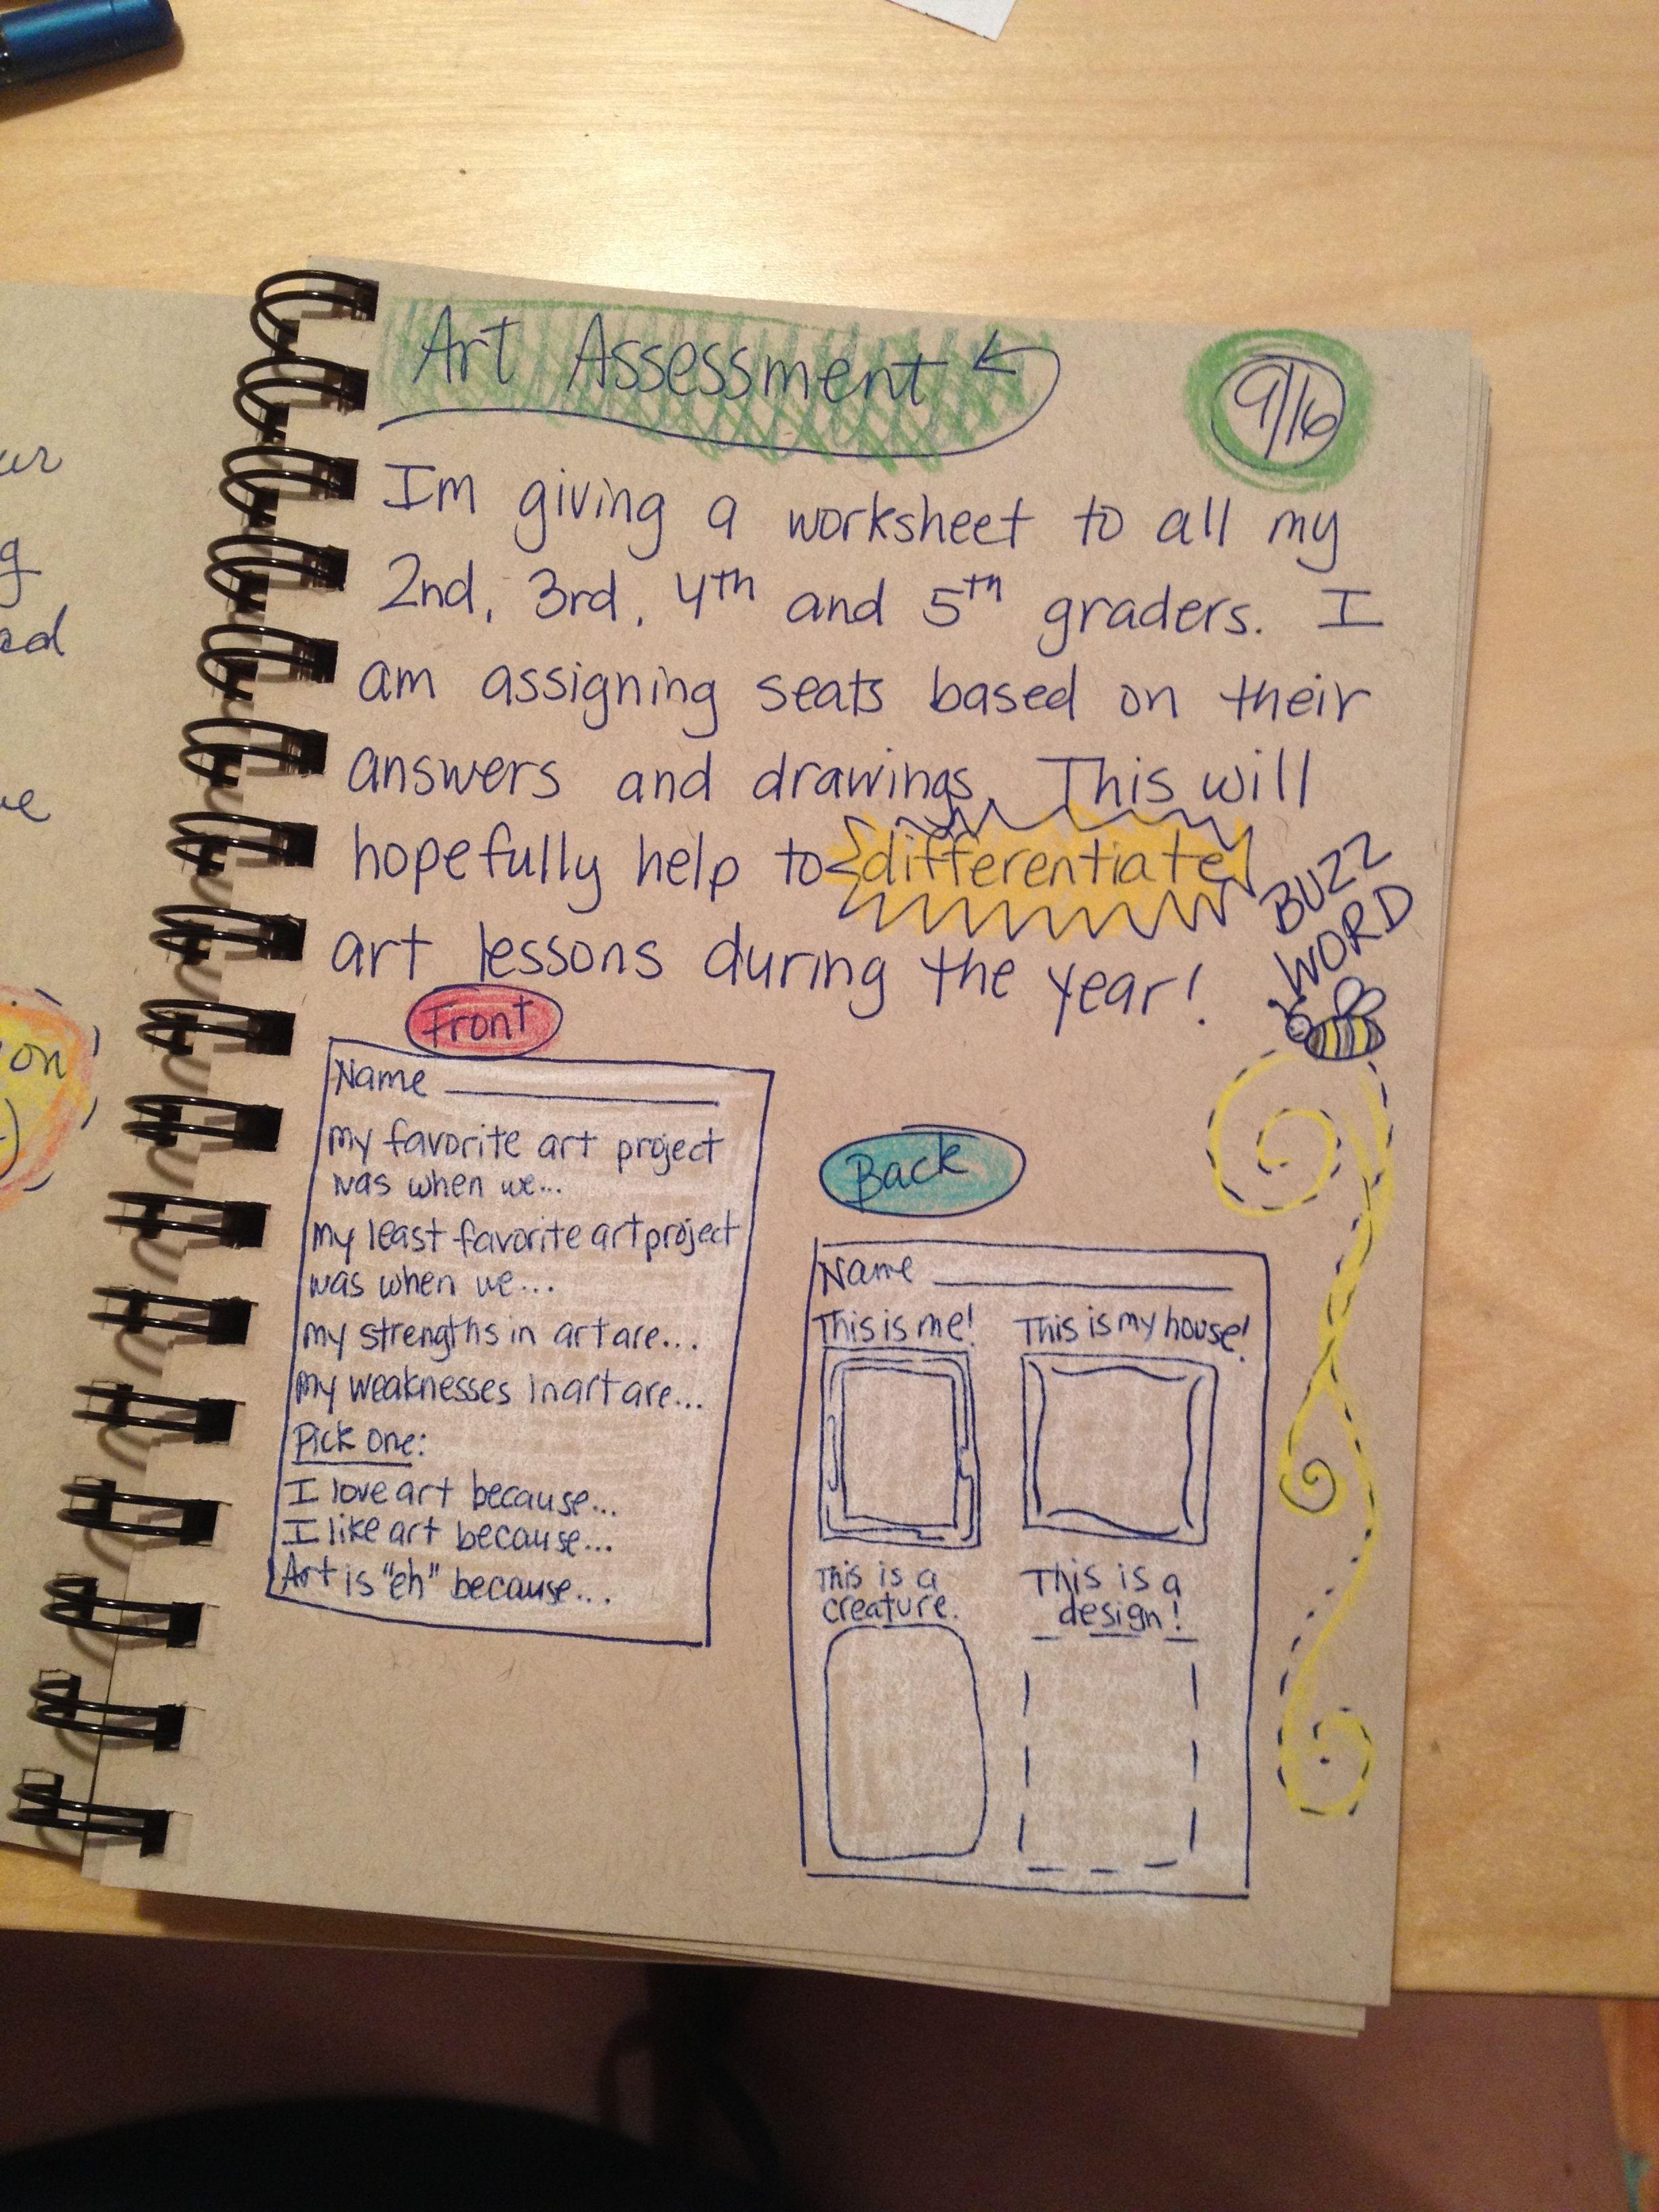 An Art Teachers Journal Assessment And Differentiation In The Art Classroom